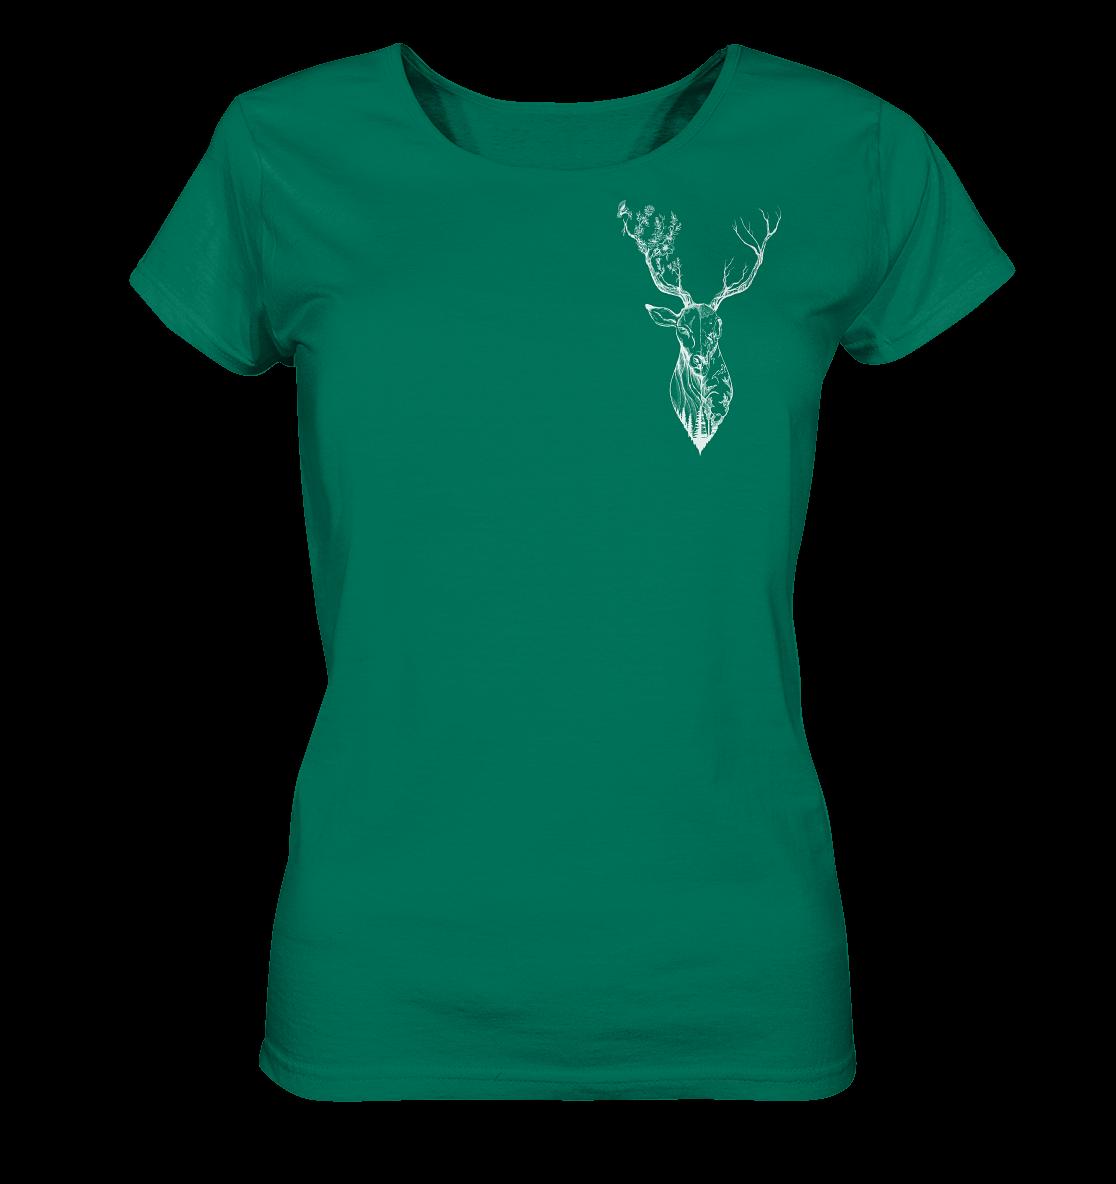 front-ladies-organic-shirt-00745b-1116x-5.png